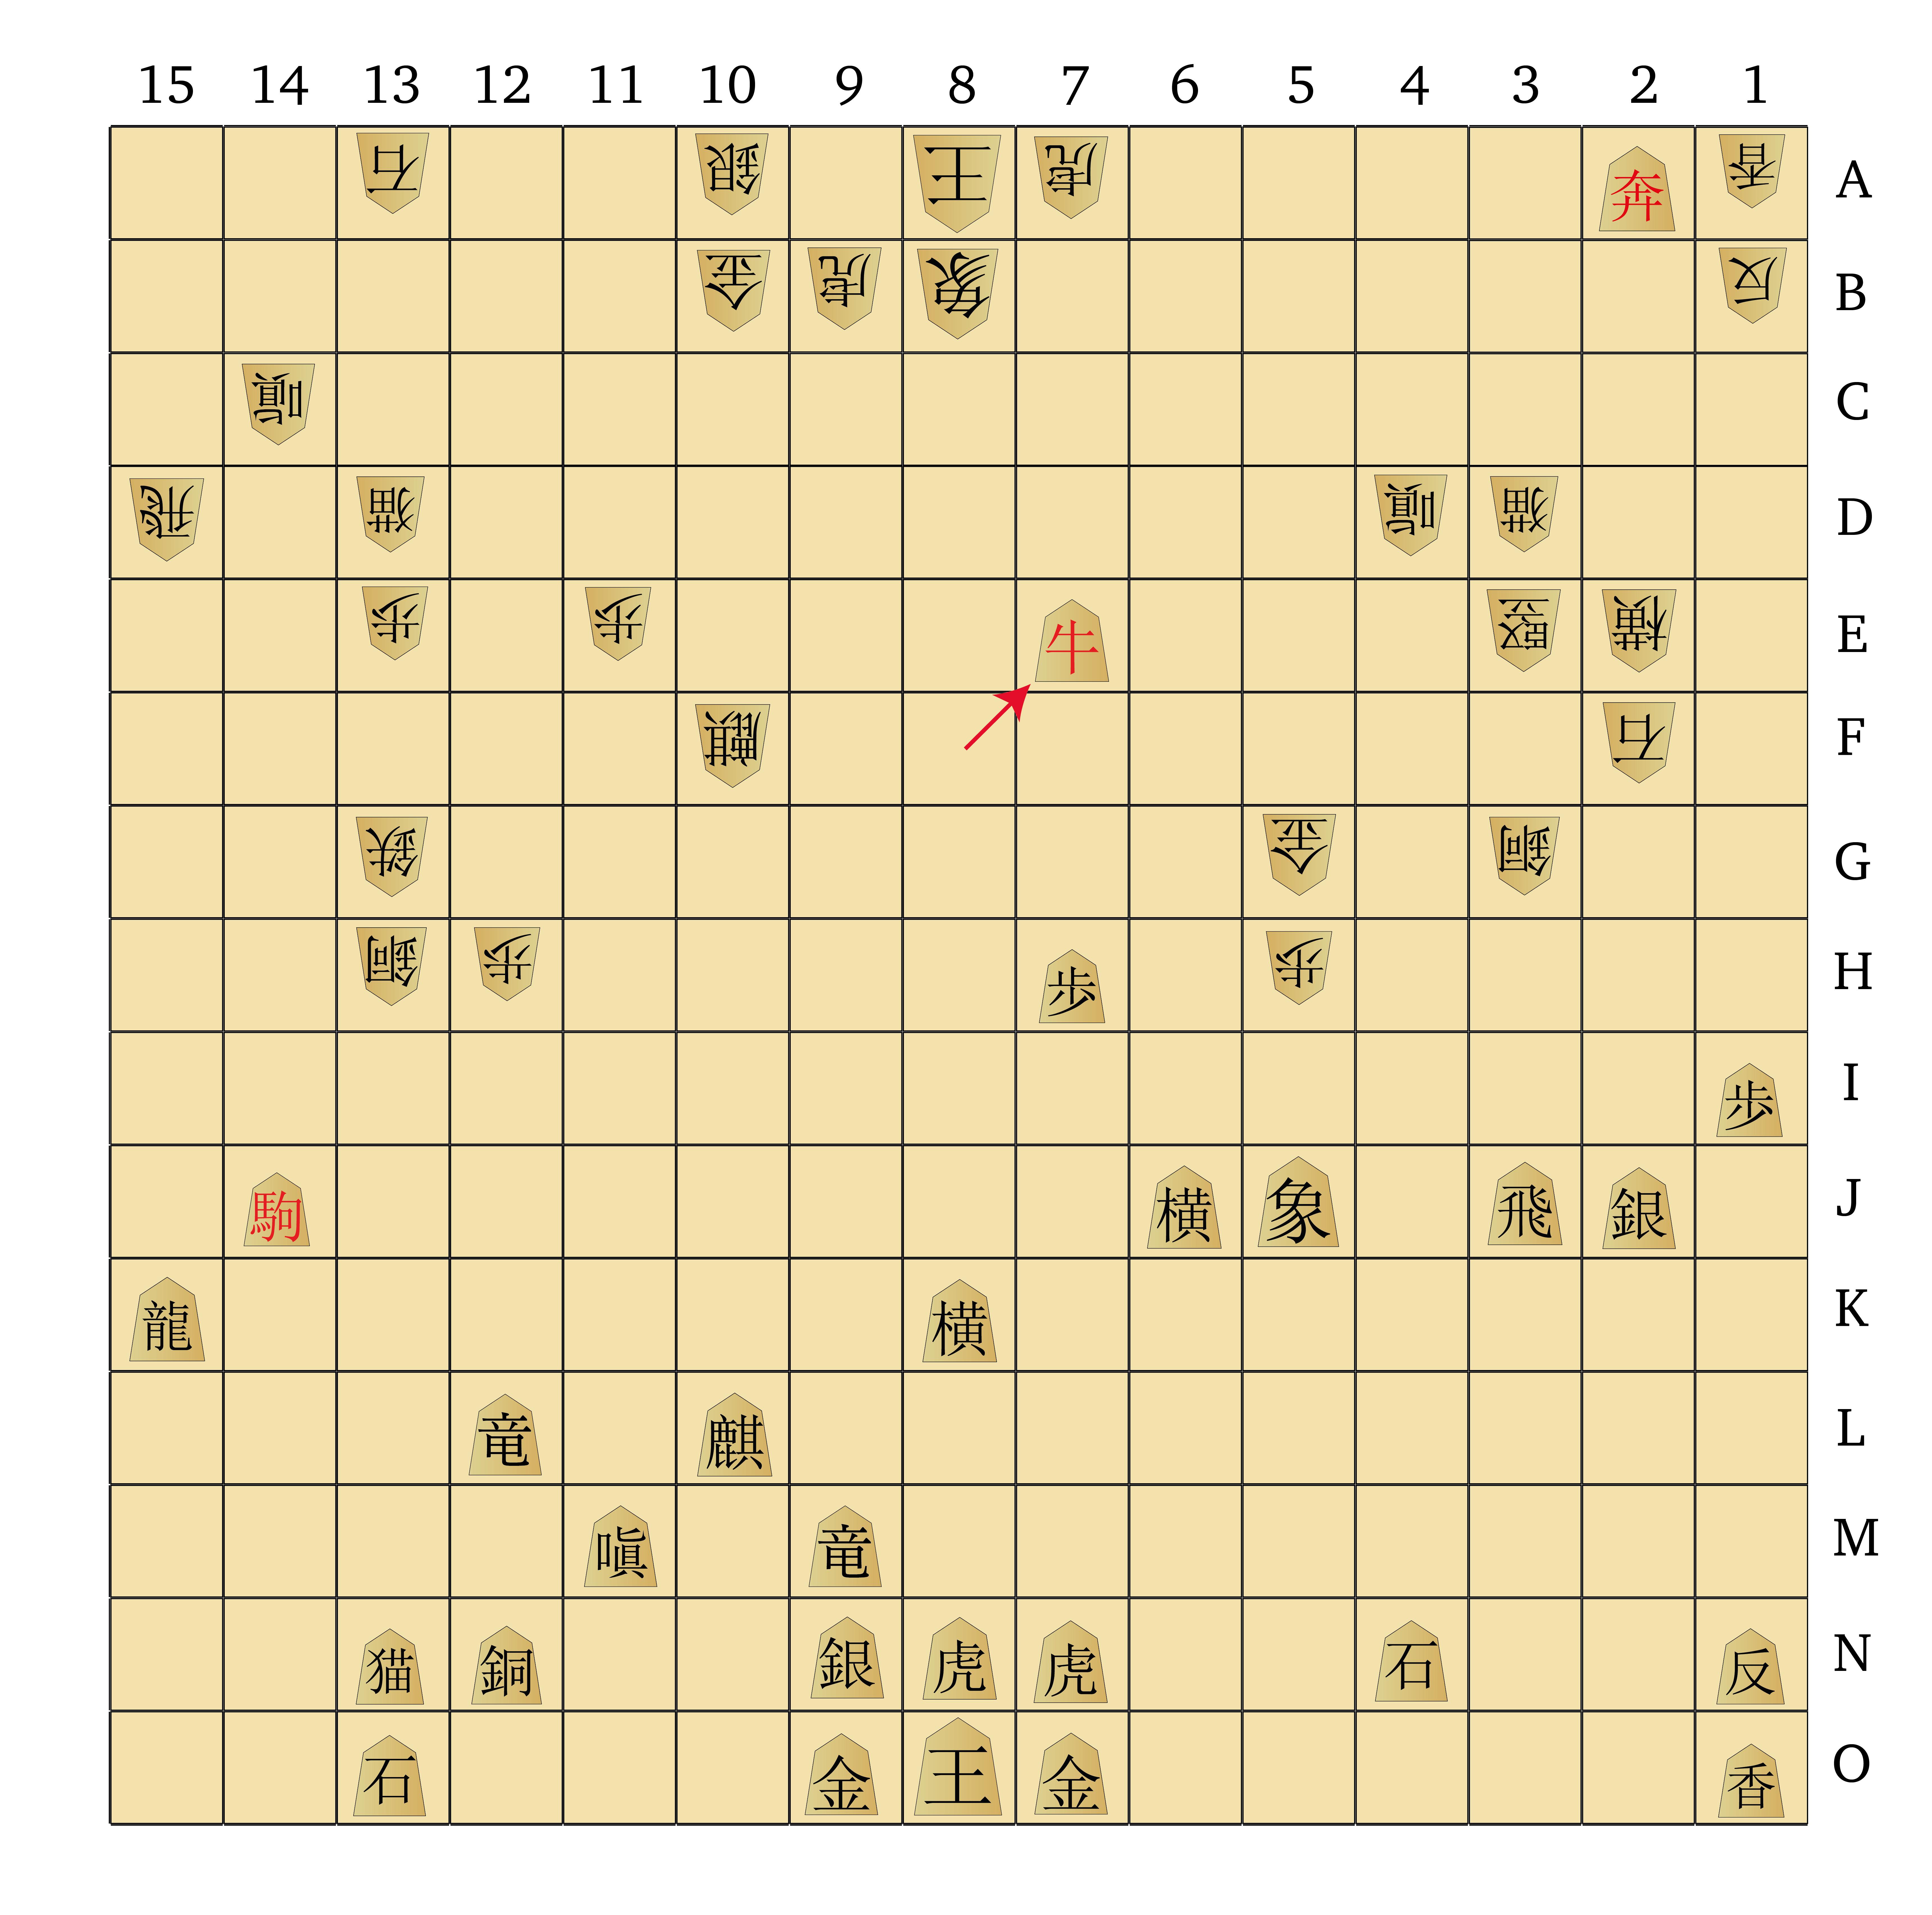 Dai Shogi 420 -- Move 435-01